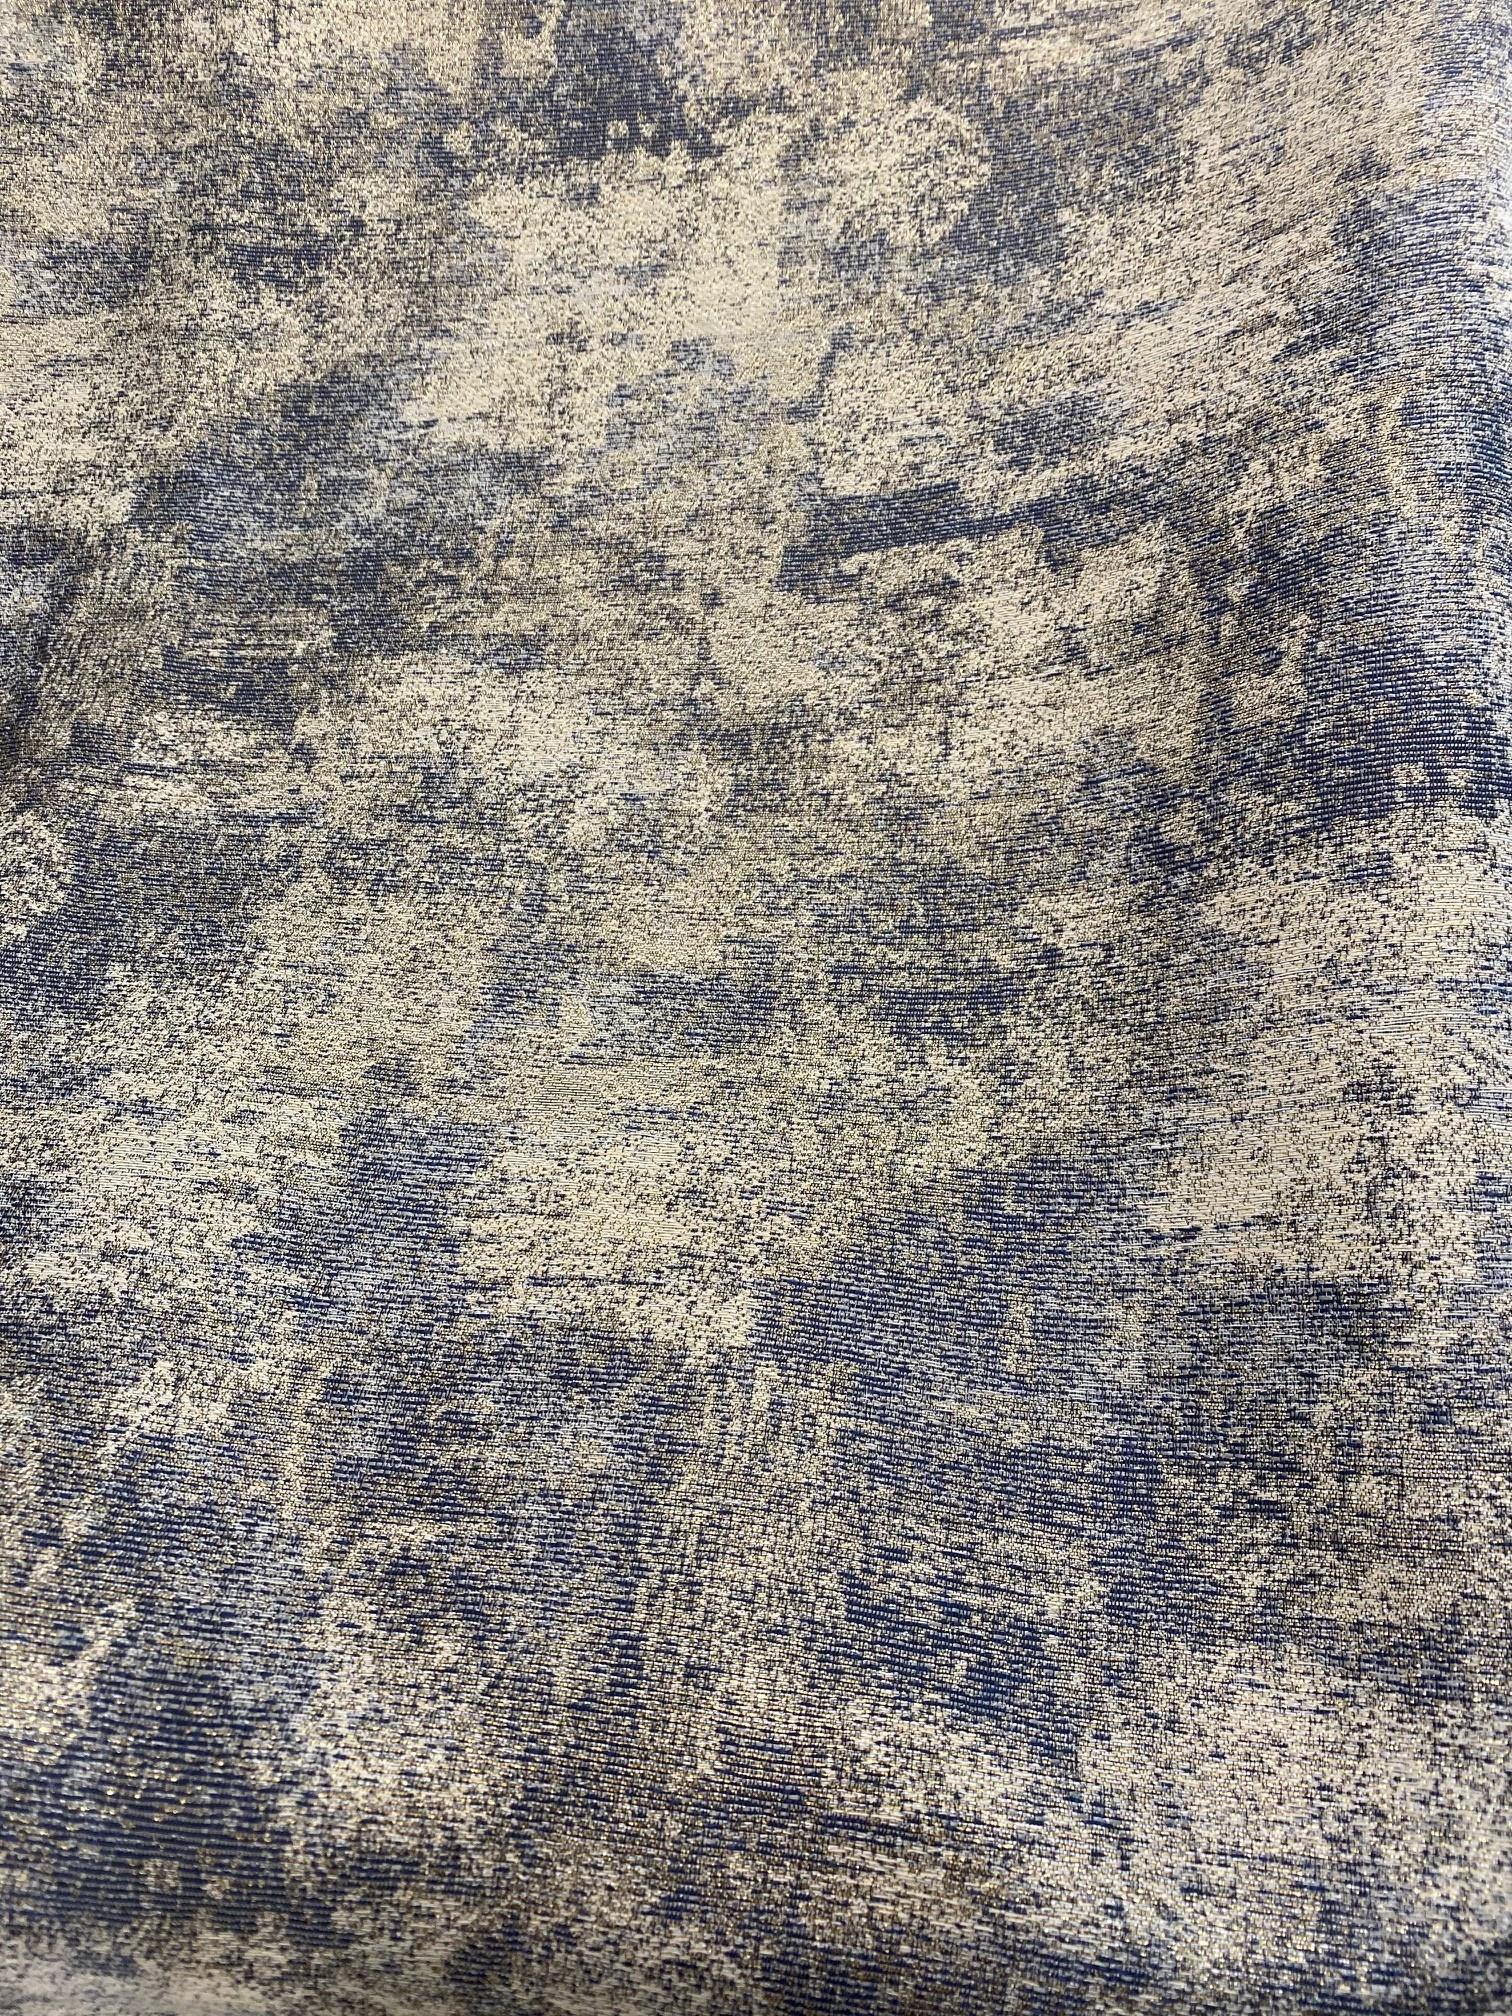 TC1302- 70 x 144 Jacquard Ivory/Blue/Gold Tablecloth